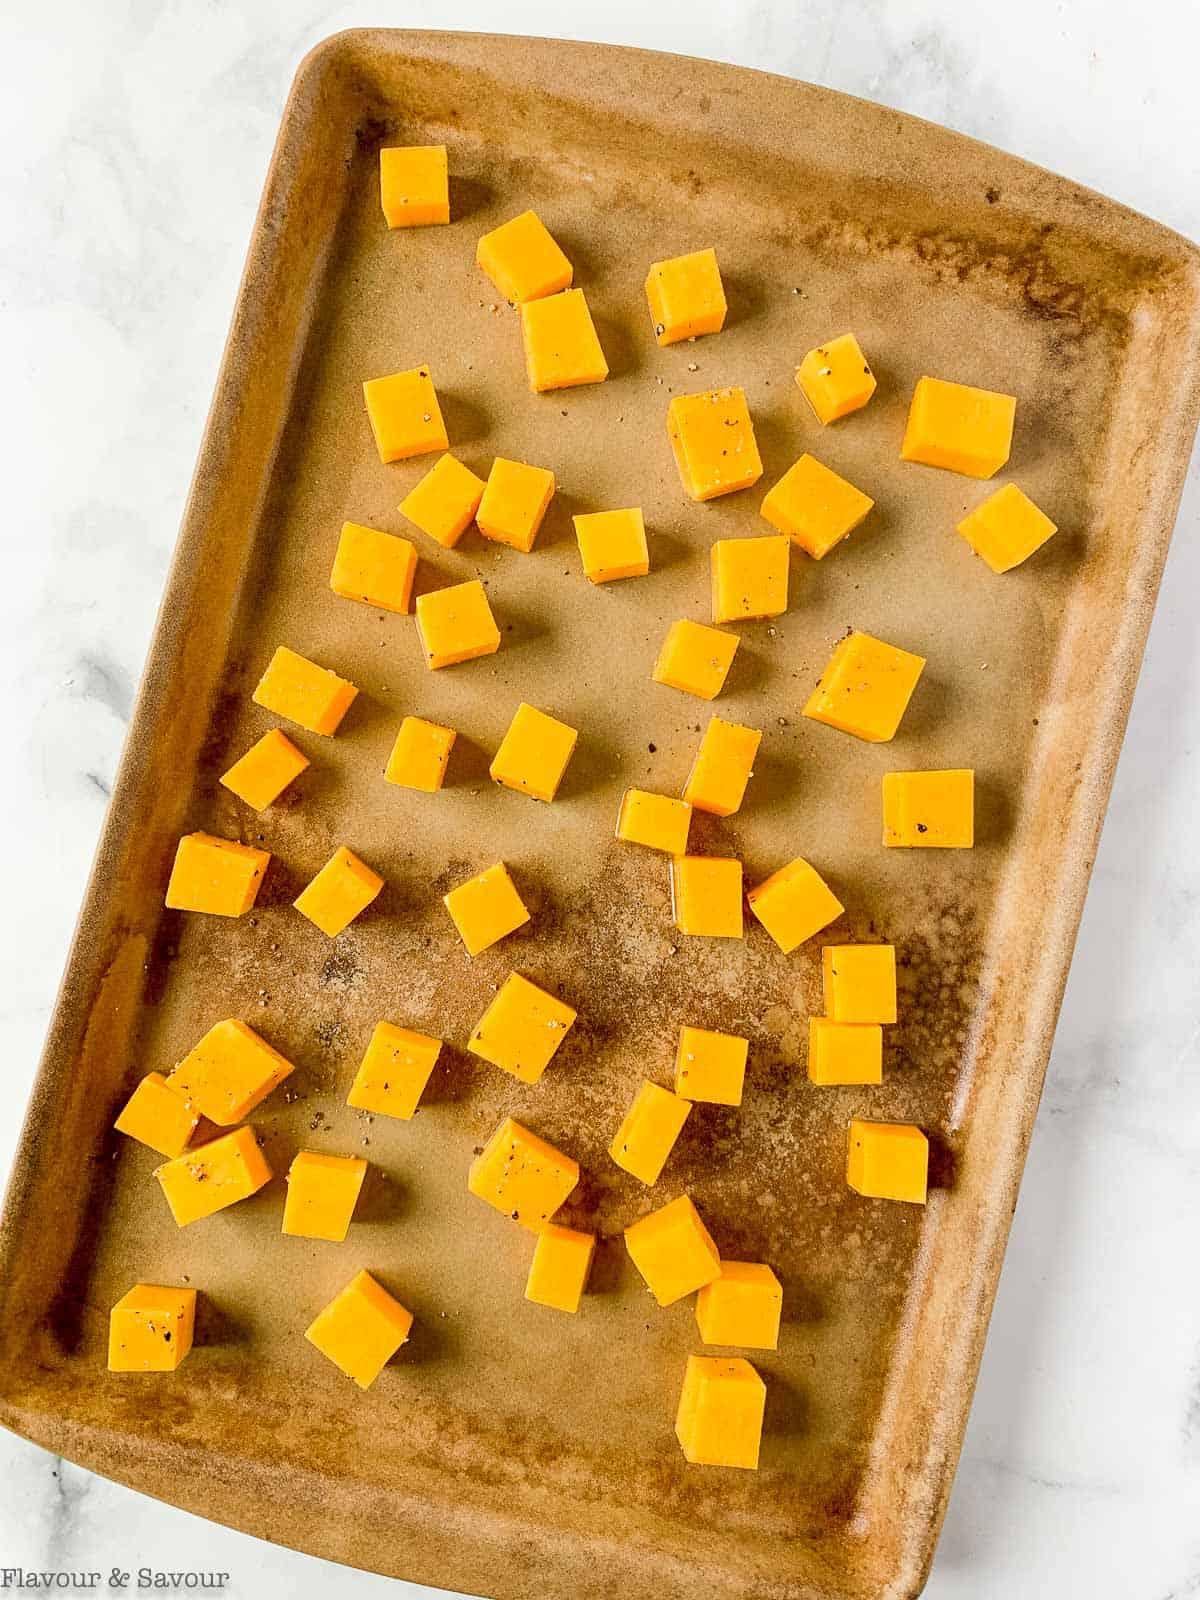 Butternut squash on a baking sheet